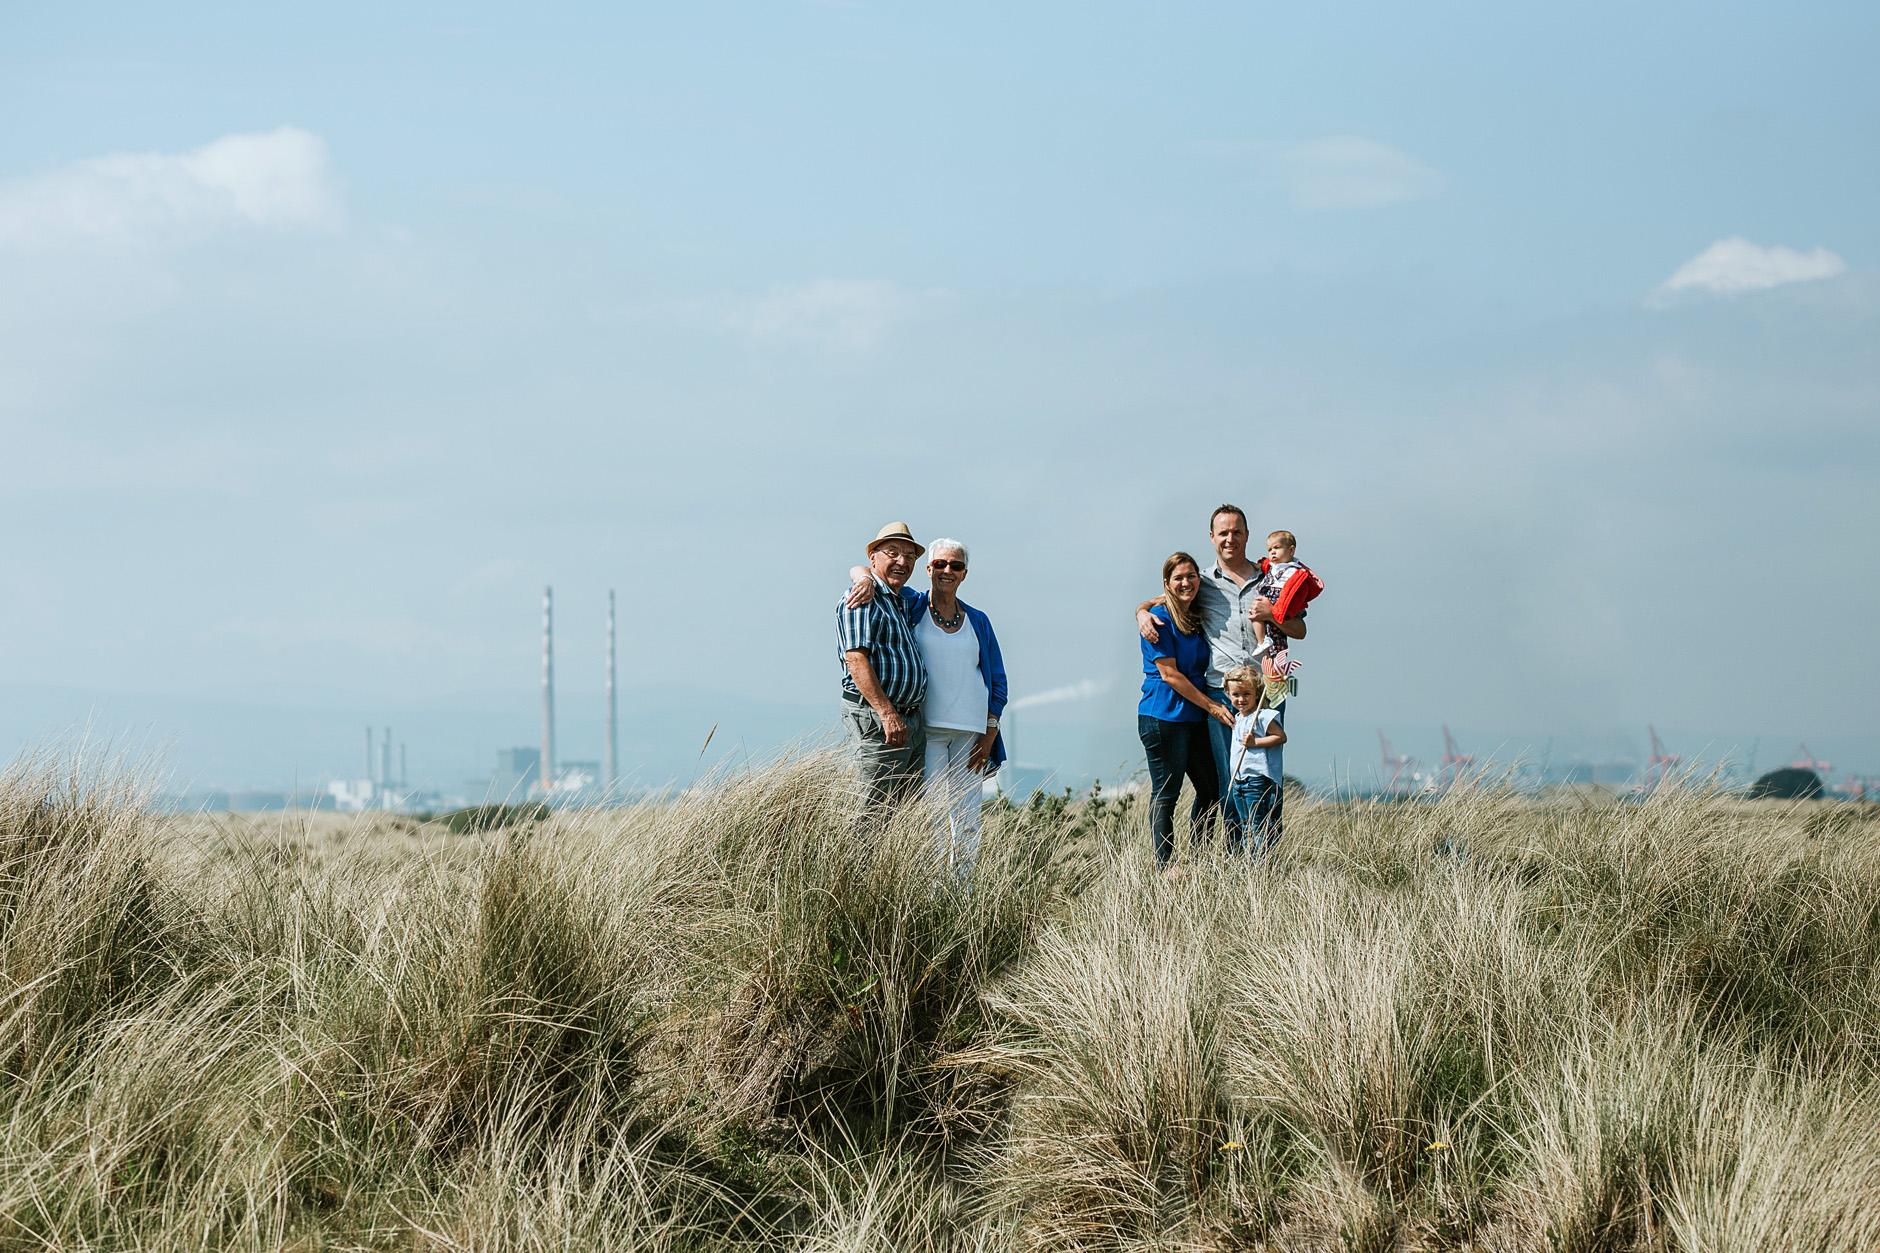 on-location-family-vacation-photographer-dublin-ireland-0086.jpg